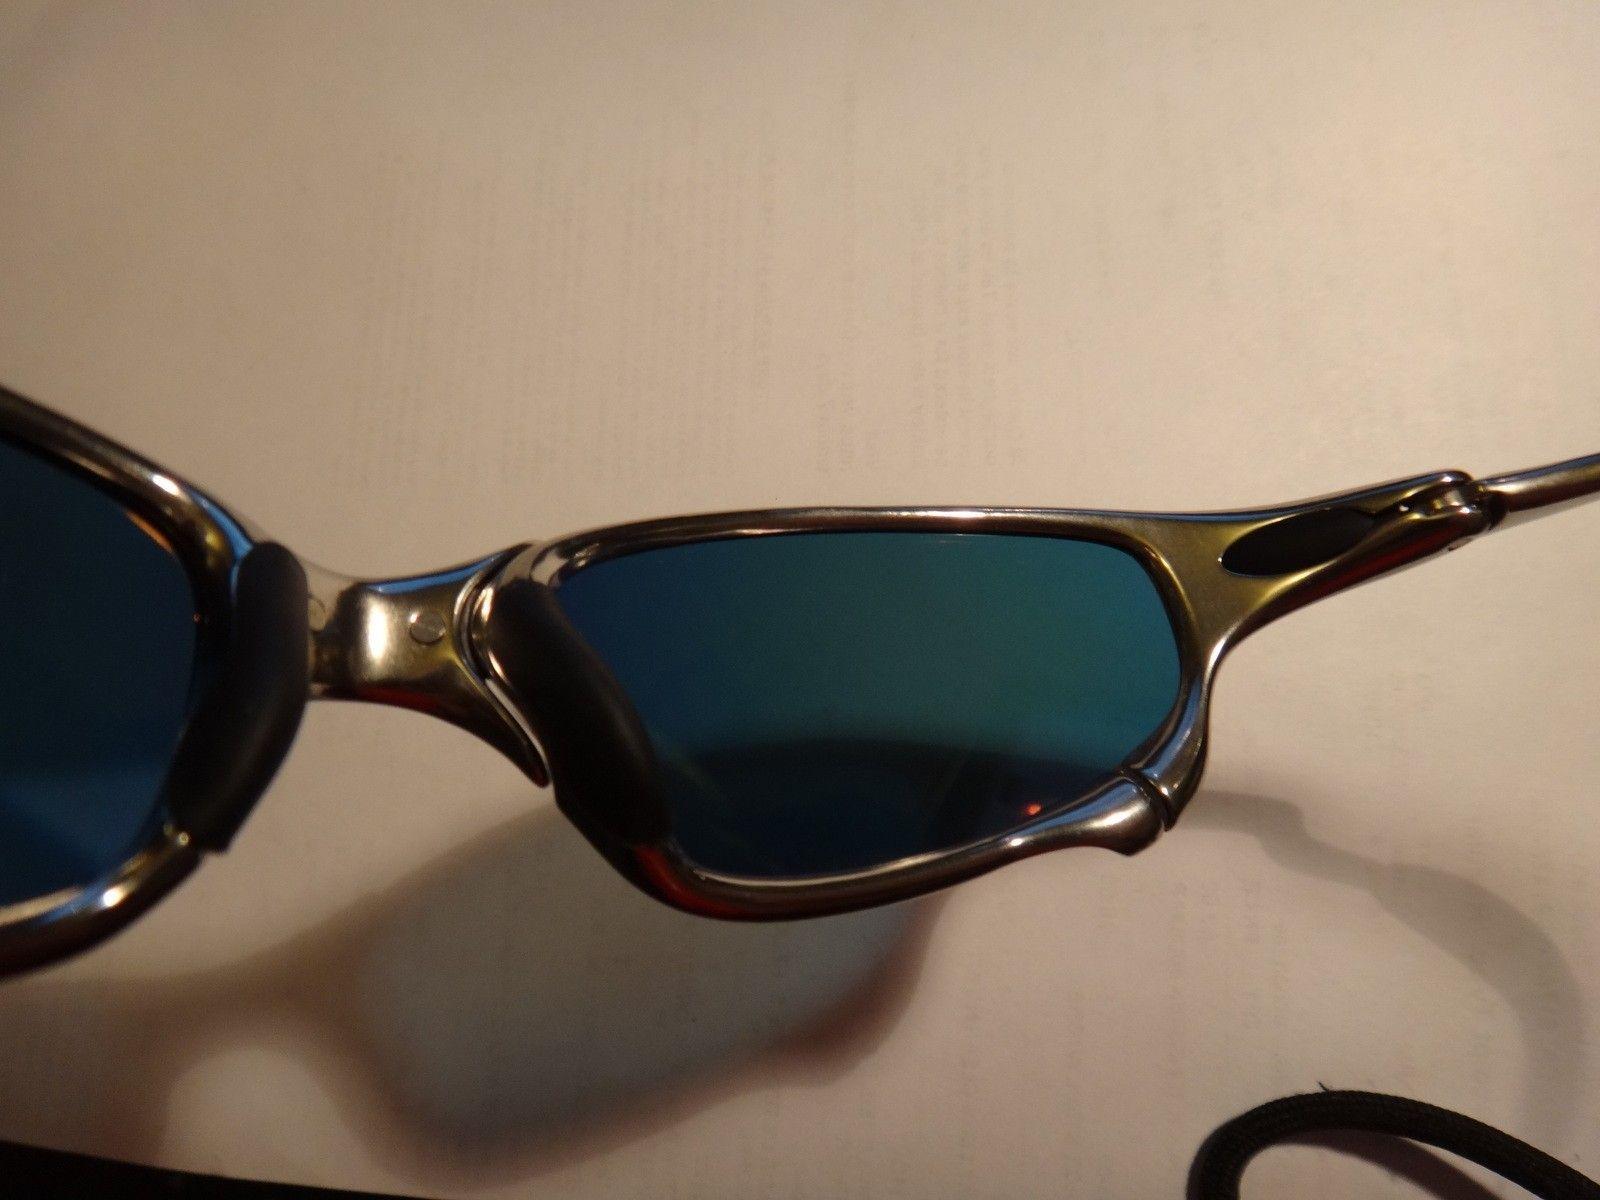 Polished juliet w/ fire iridium polarized lens $365 contUS - DSC07483.JPG